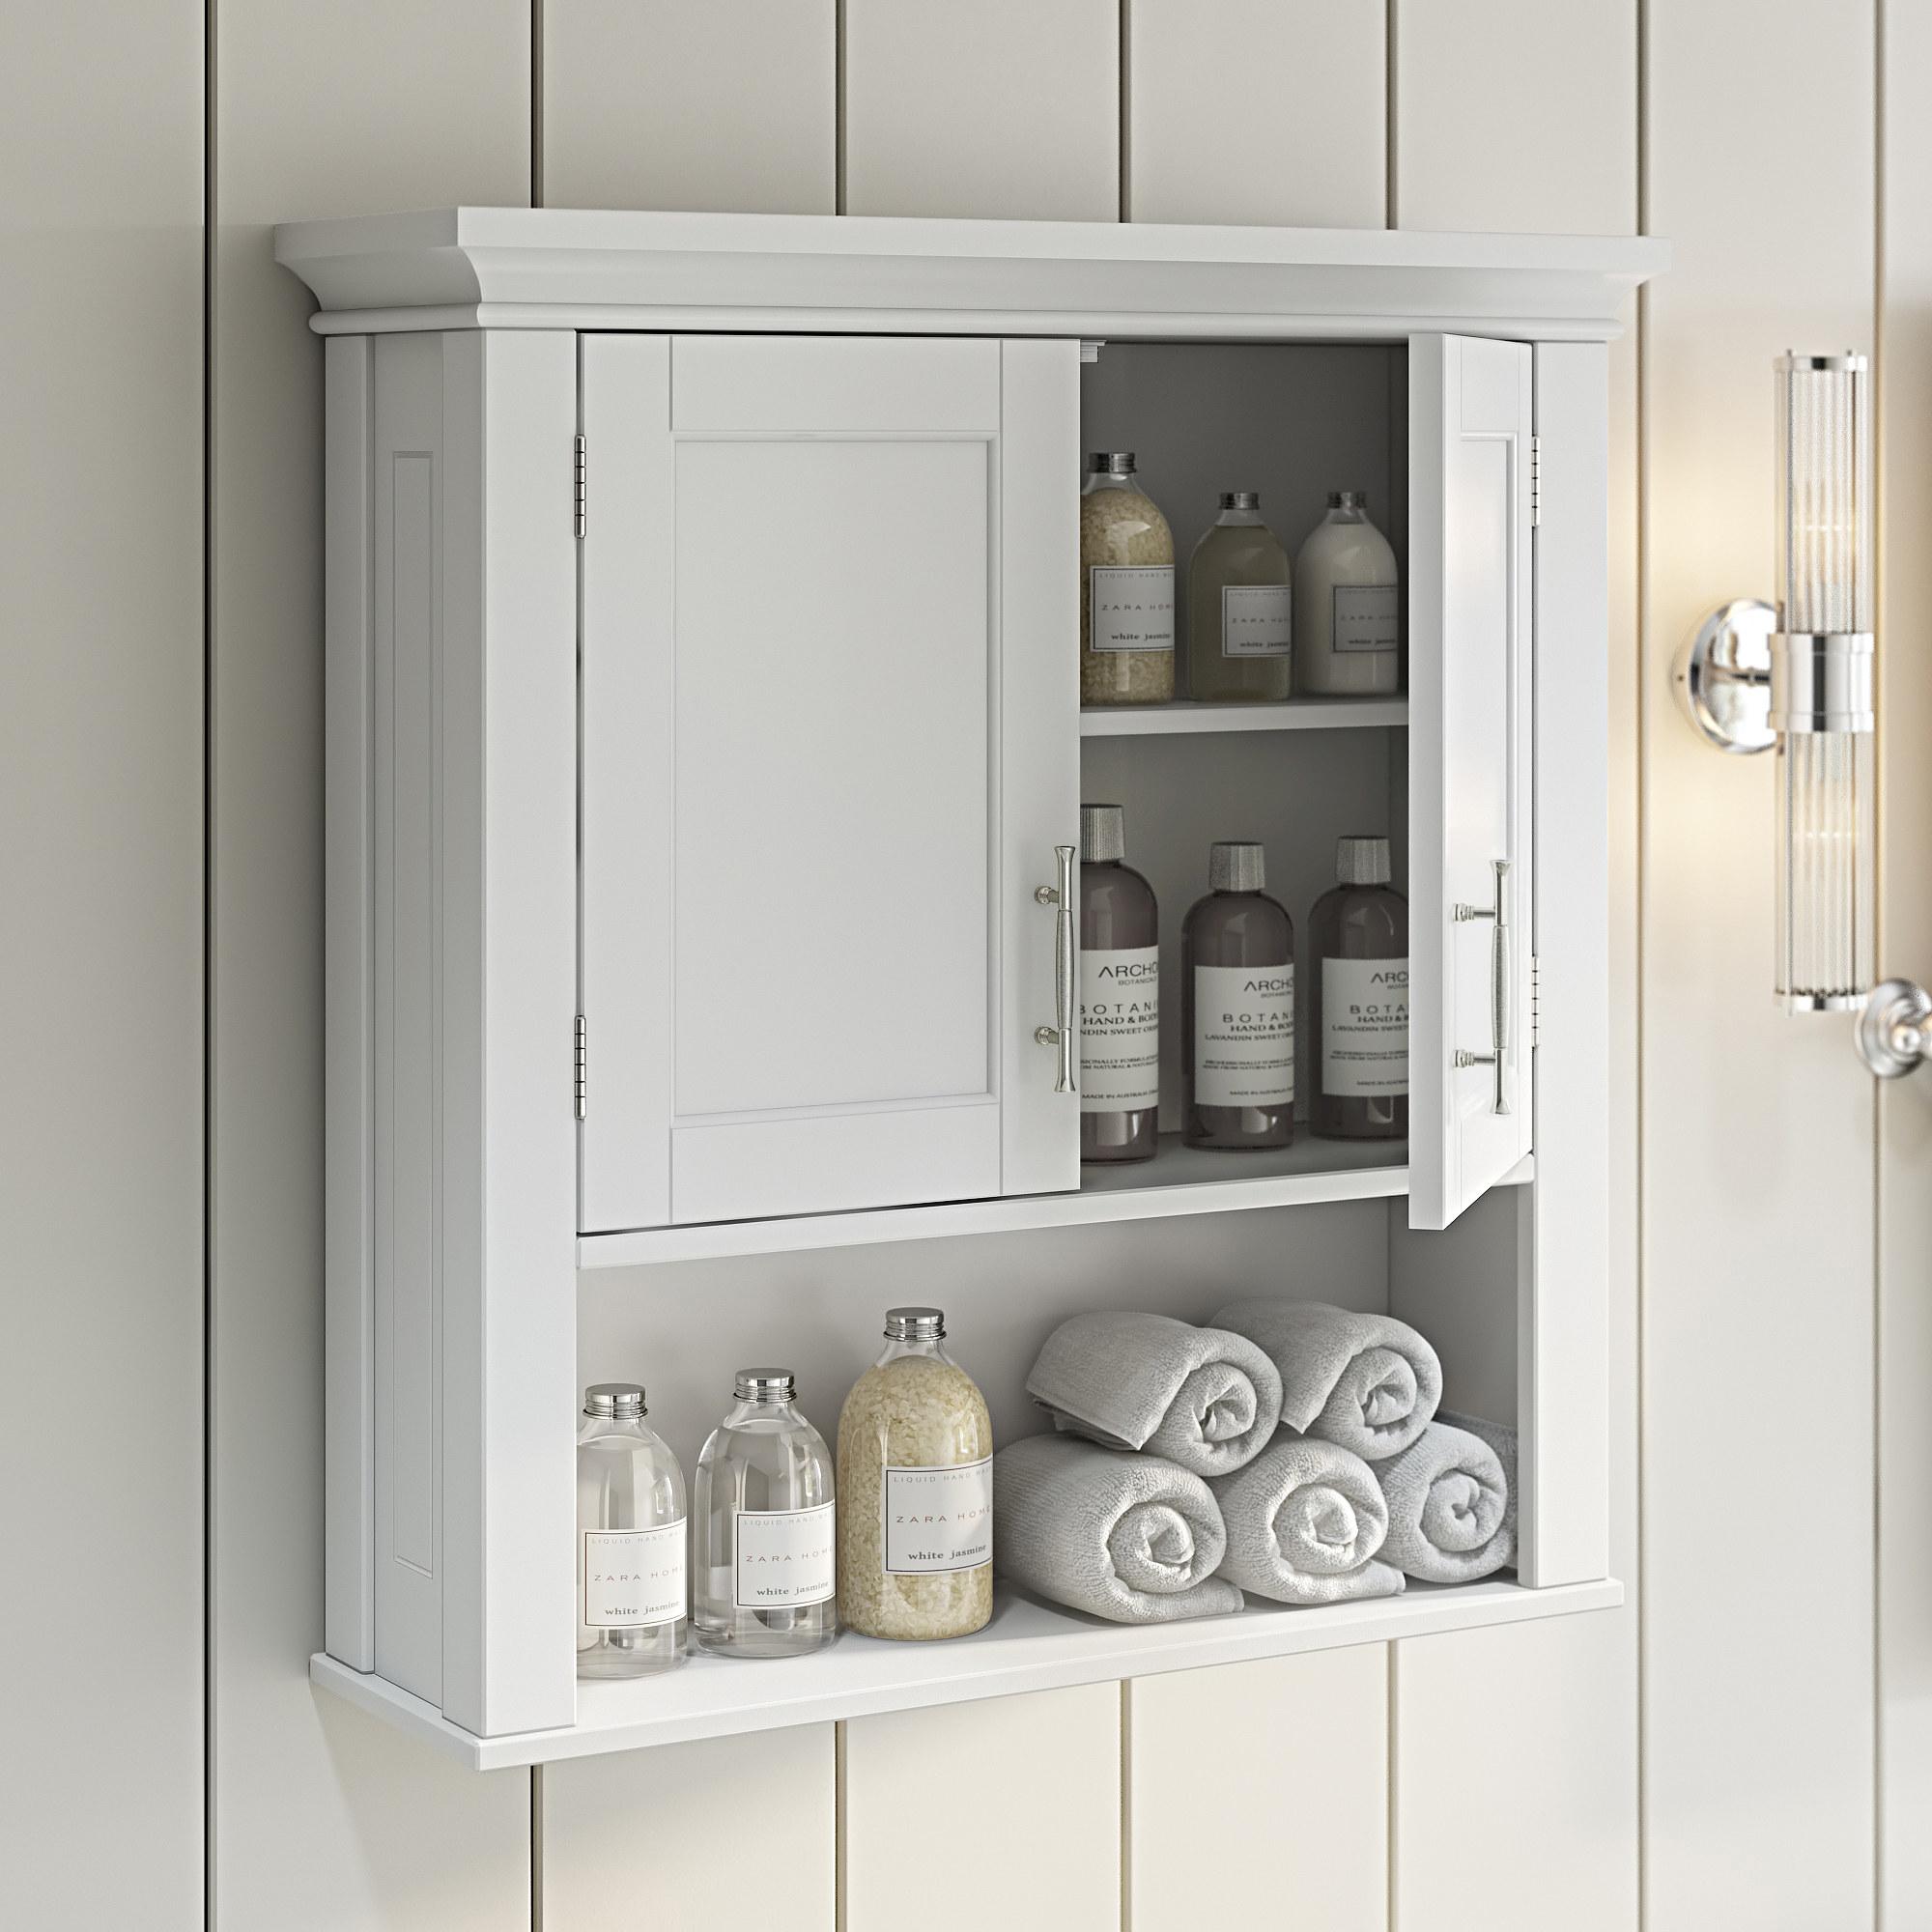 The bathroom storage wall cabinet